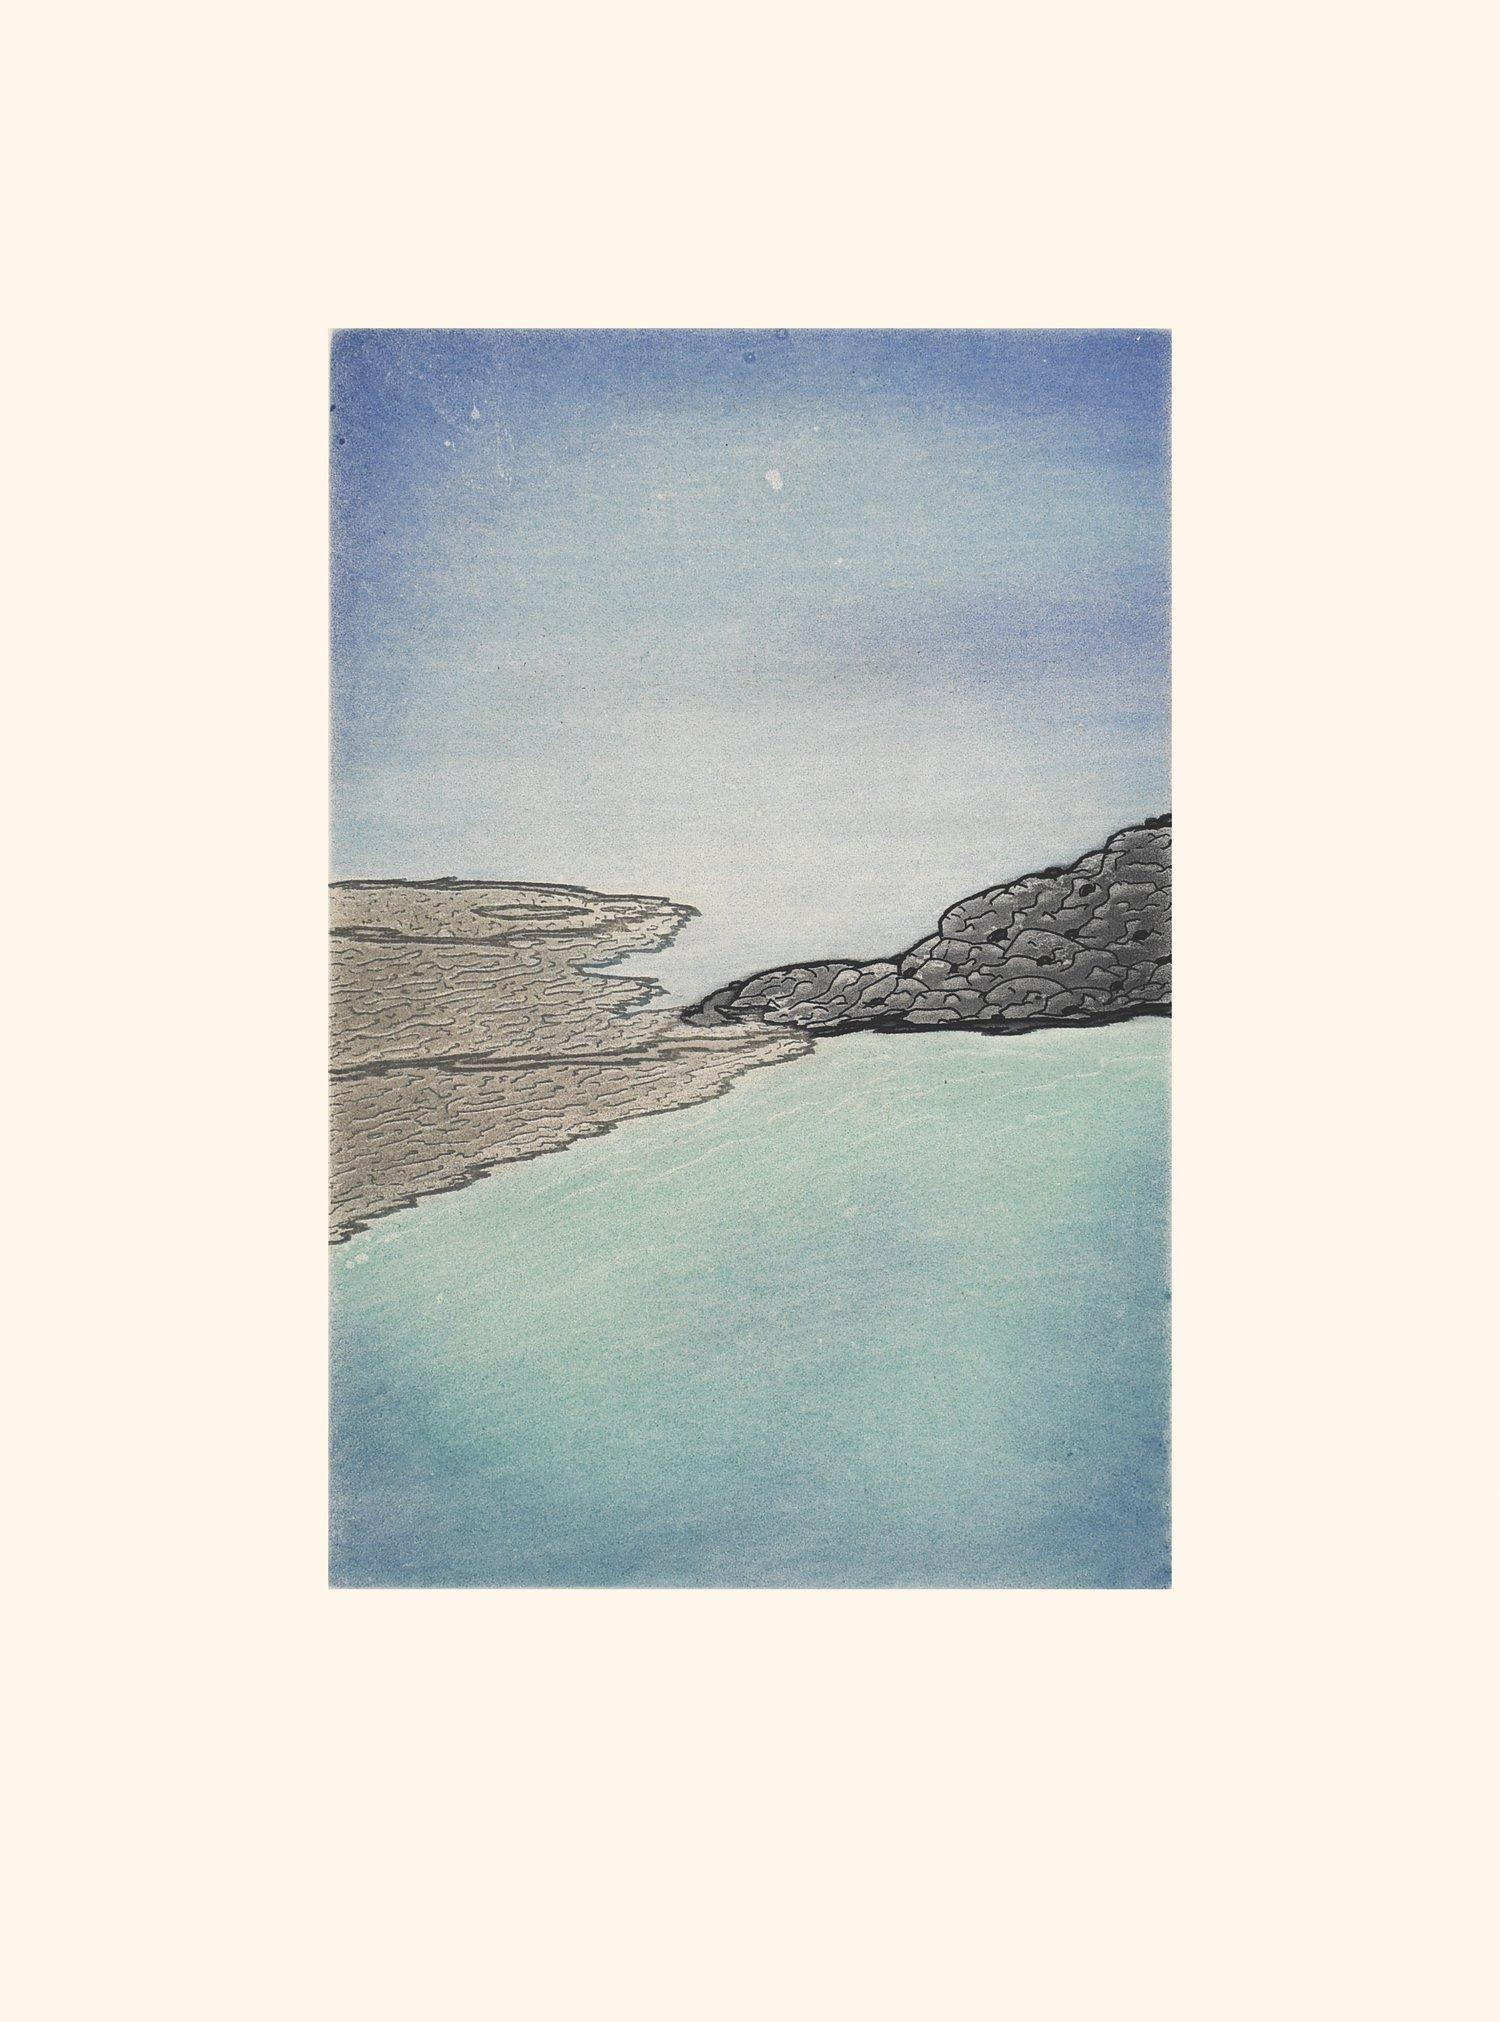 "NICOTYE SAMAYUALIE 20. Sikkuksartuq (Ice Forming) Etching & Aquatint Paper: Arches White Printer: Studio PM 48 x 35.5 cm 19"" x 14"" $ 500 $400 375"